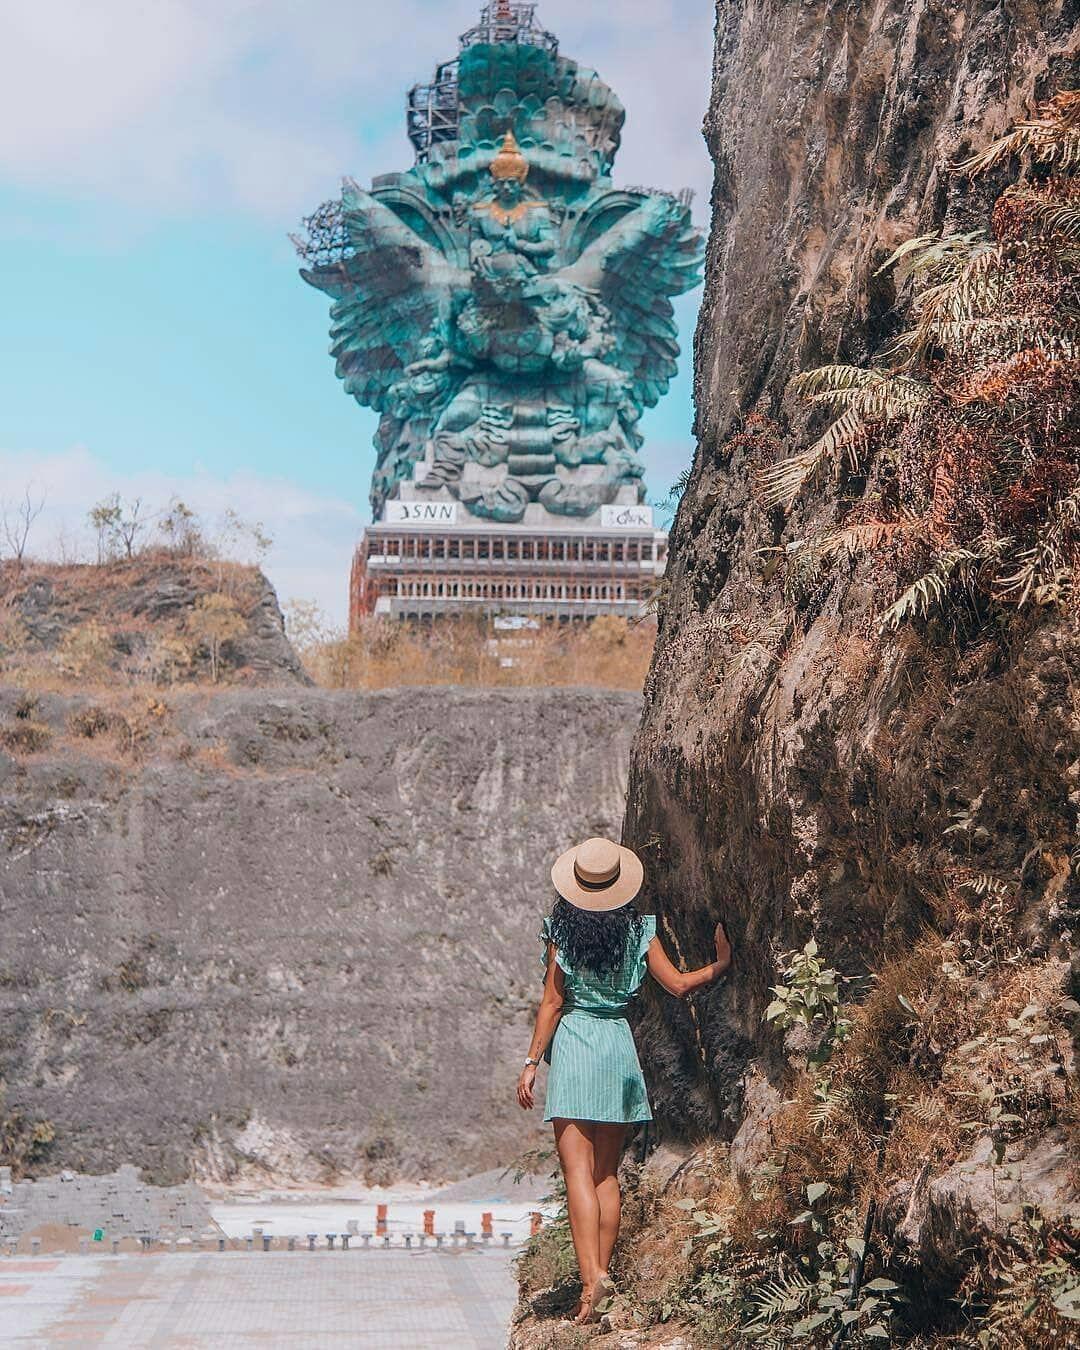 Setelah Menanti 28 Tahun, Ini 10 Potret Kemegahan Patung GWK di Bali